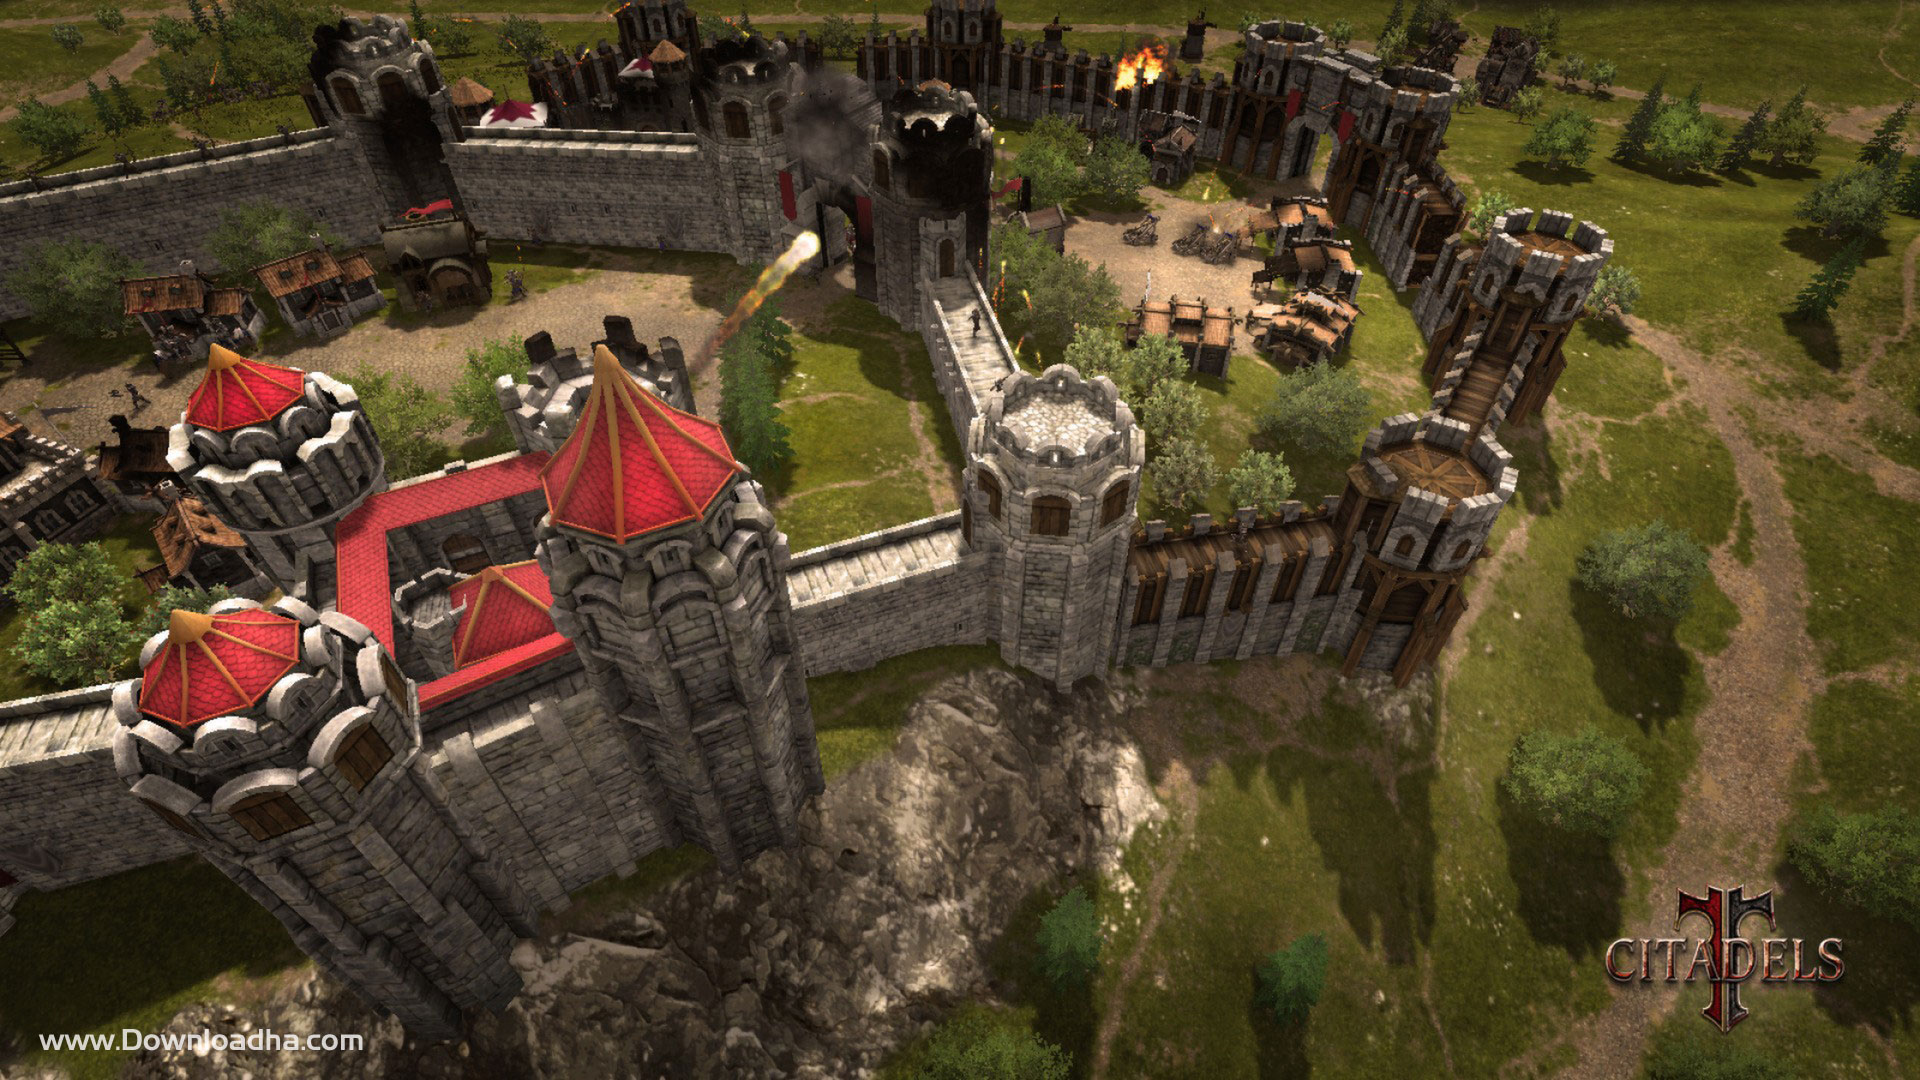 http://img5.downloadha.com/hosein/Game/July%202013/26/Citadels-screenshots-02-large.jpg